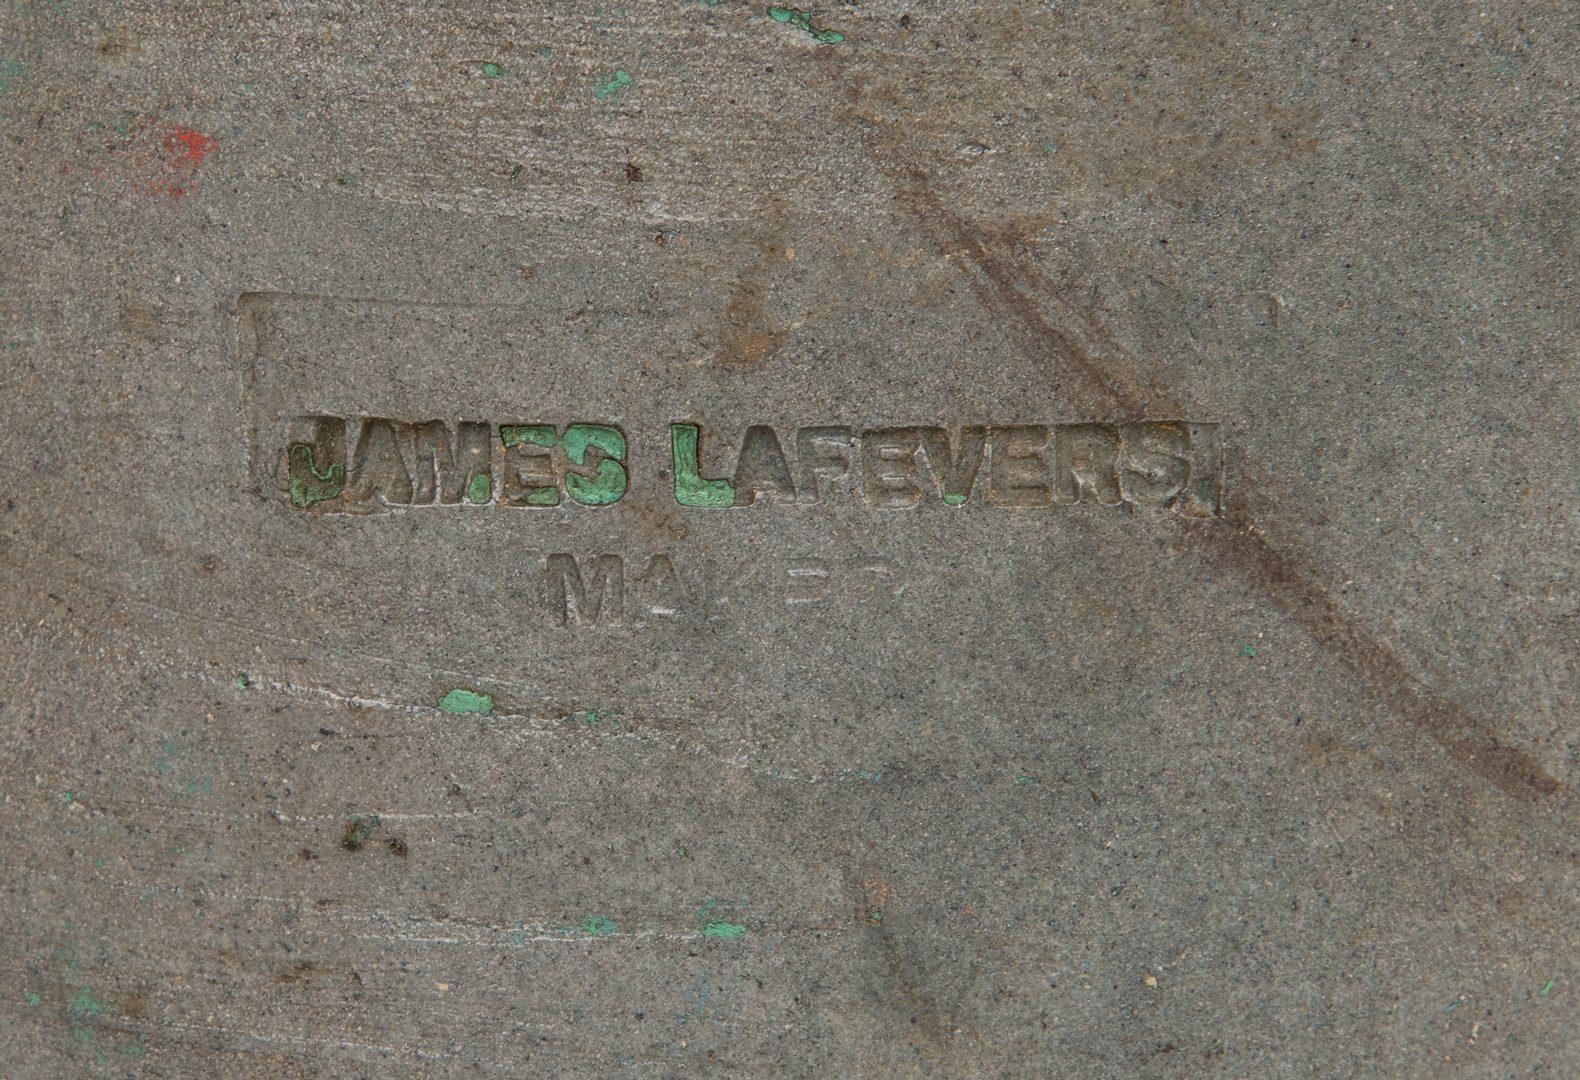 Lot 188: James Lafever 5-gallon Pottery Jug